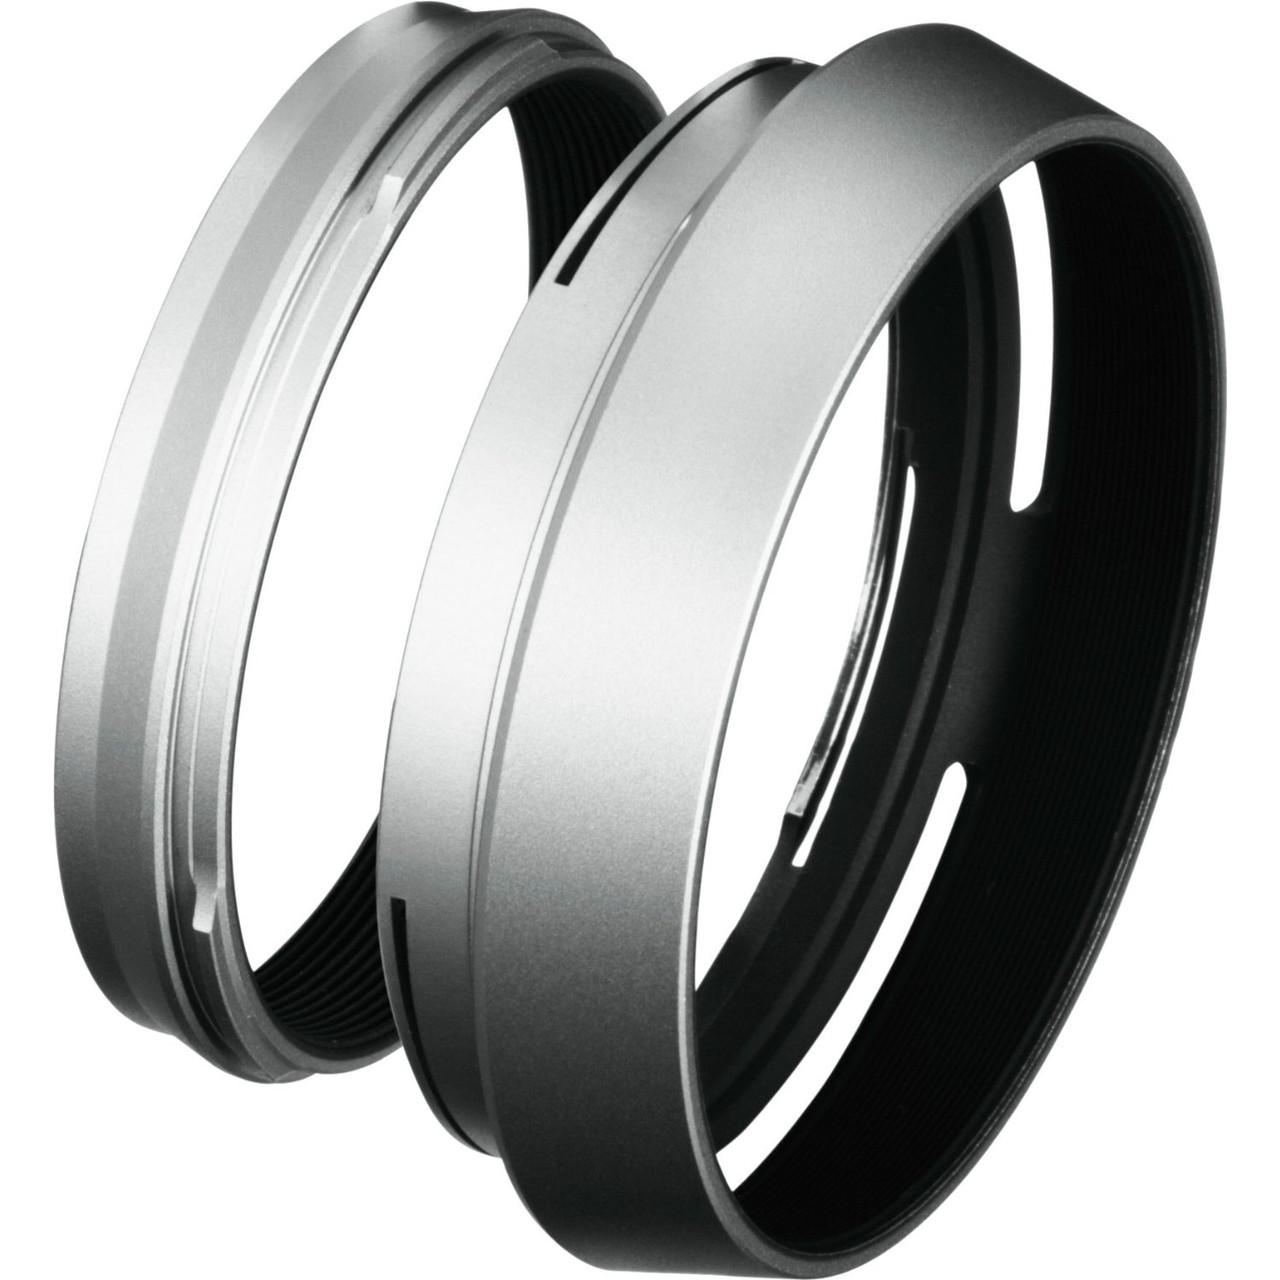 Fujifilm LH-X100 Lens Hood + Adapter Ring  (Silver)